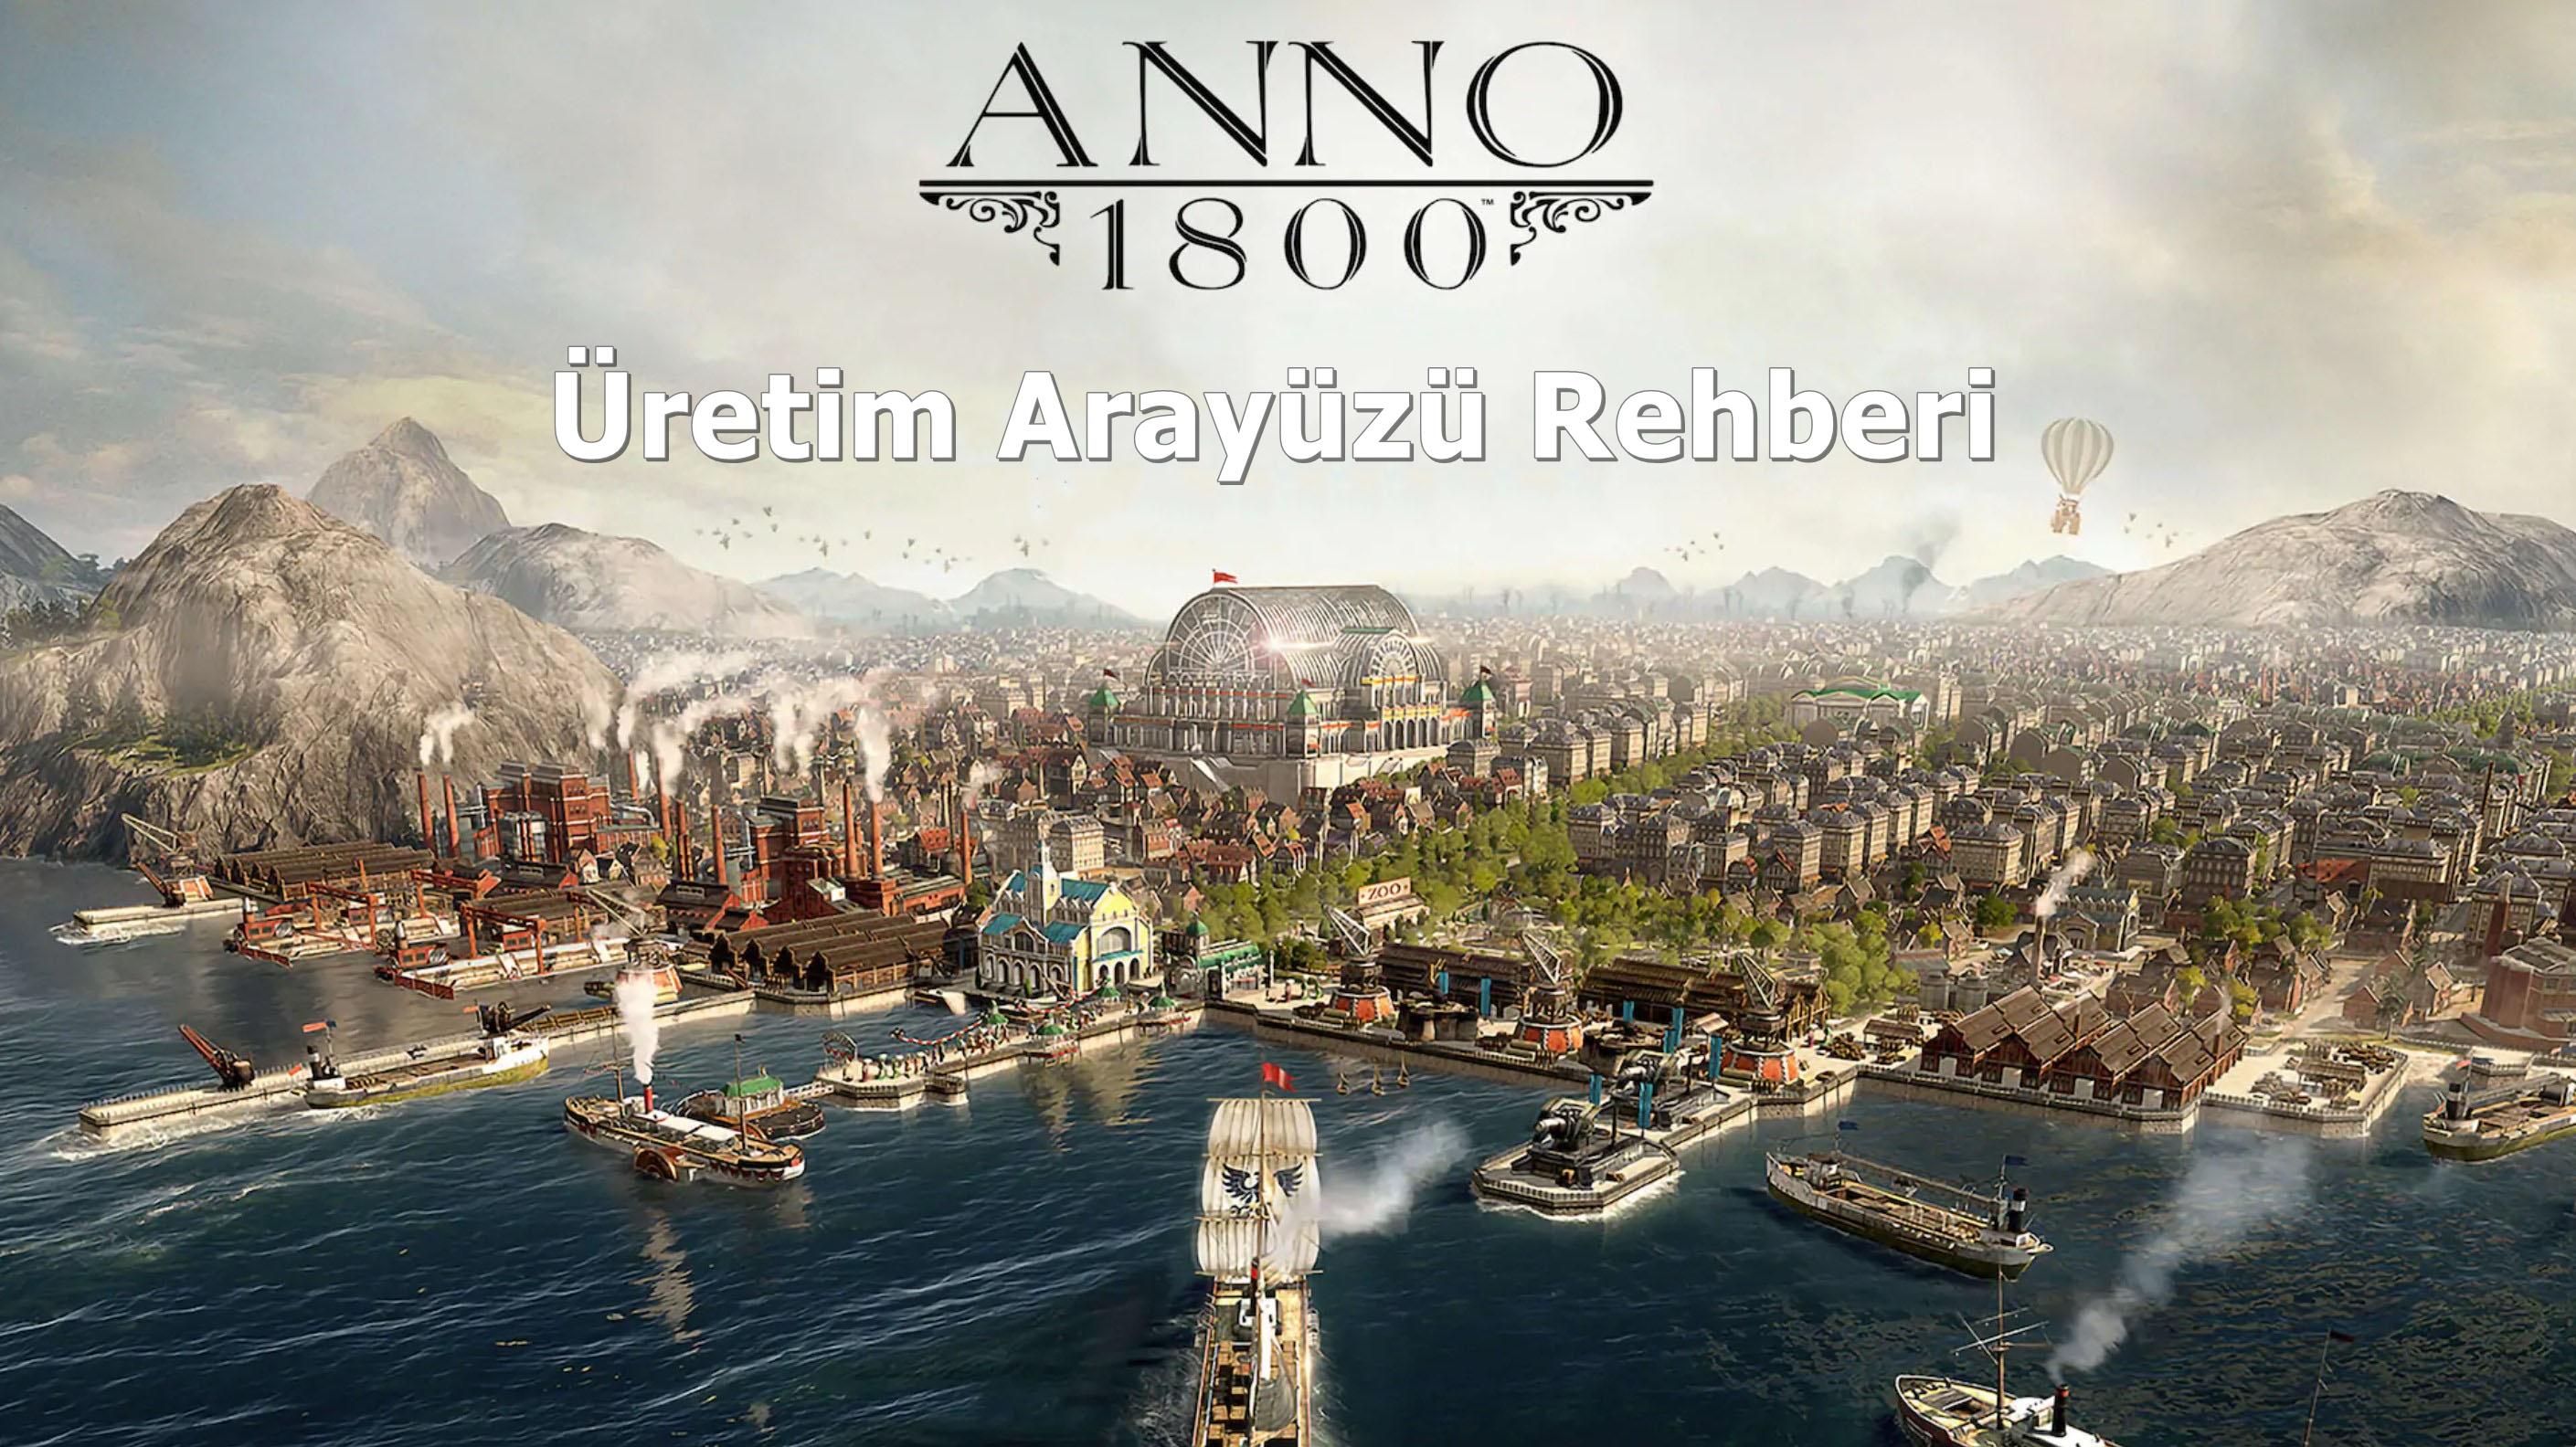 anno_1800.jpg